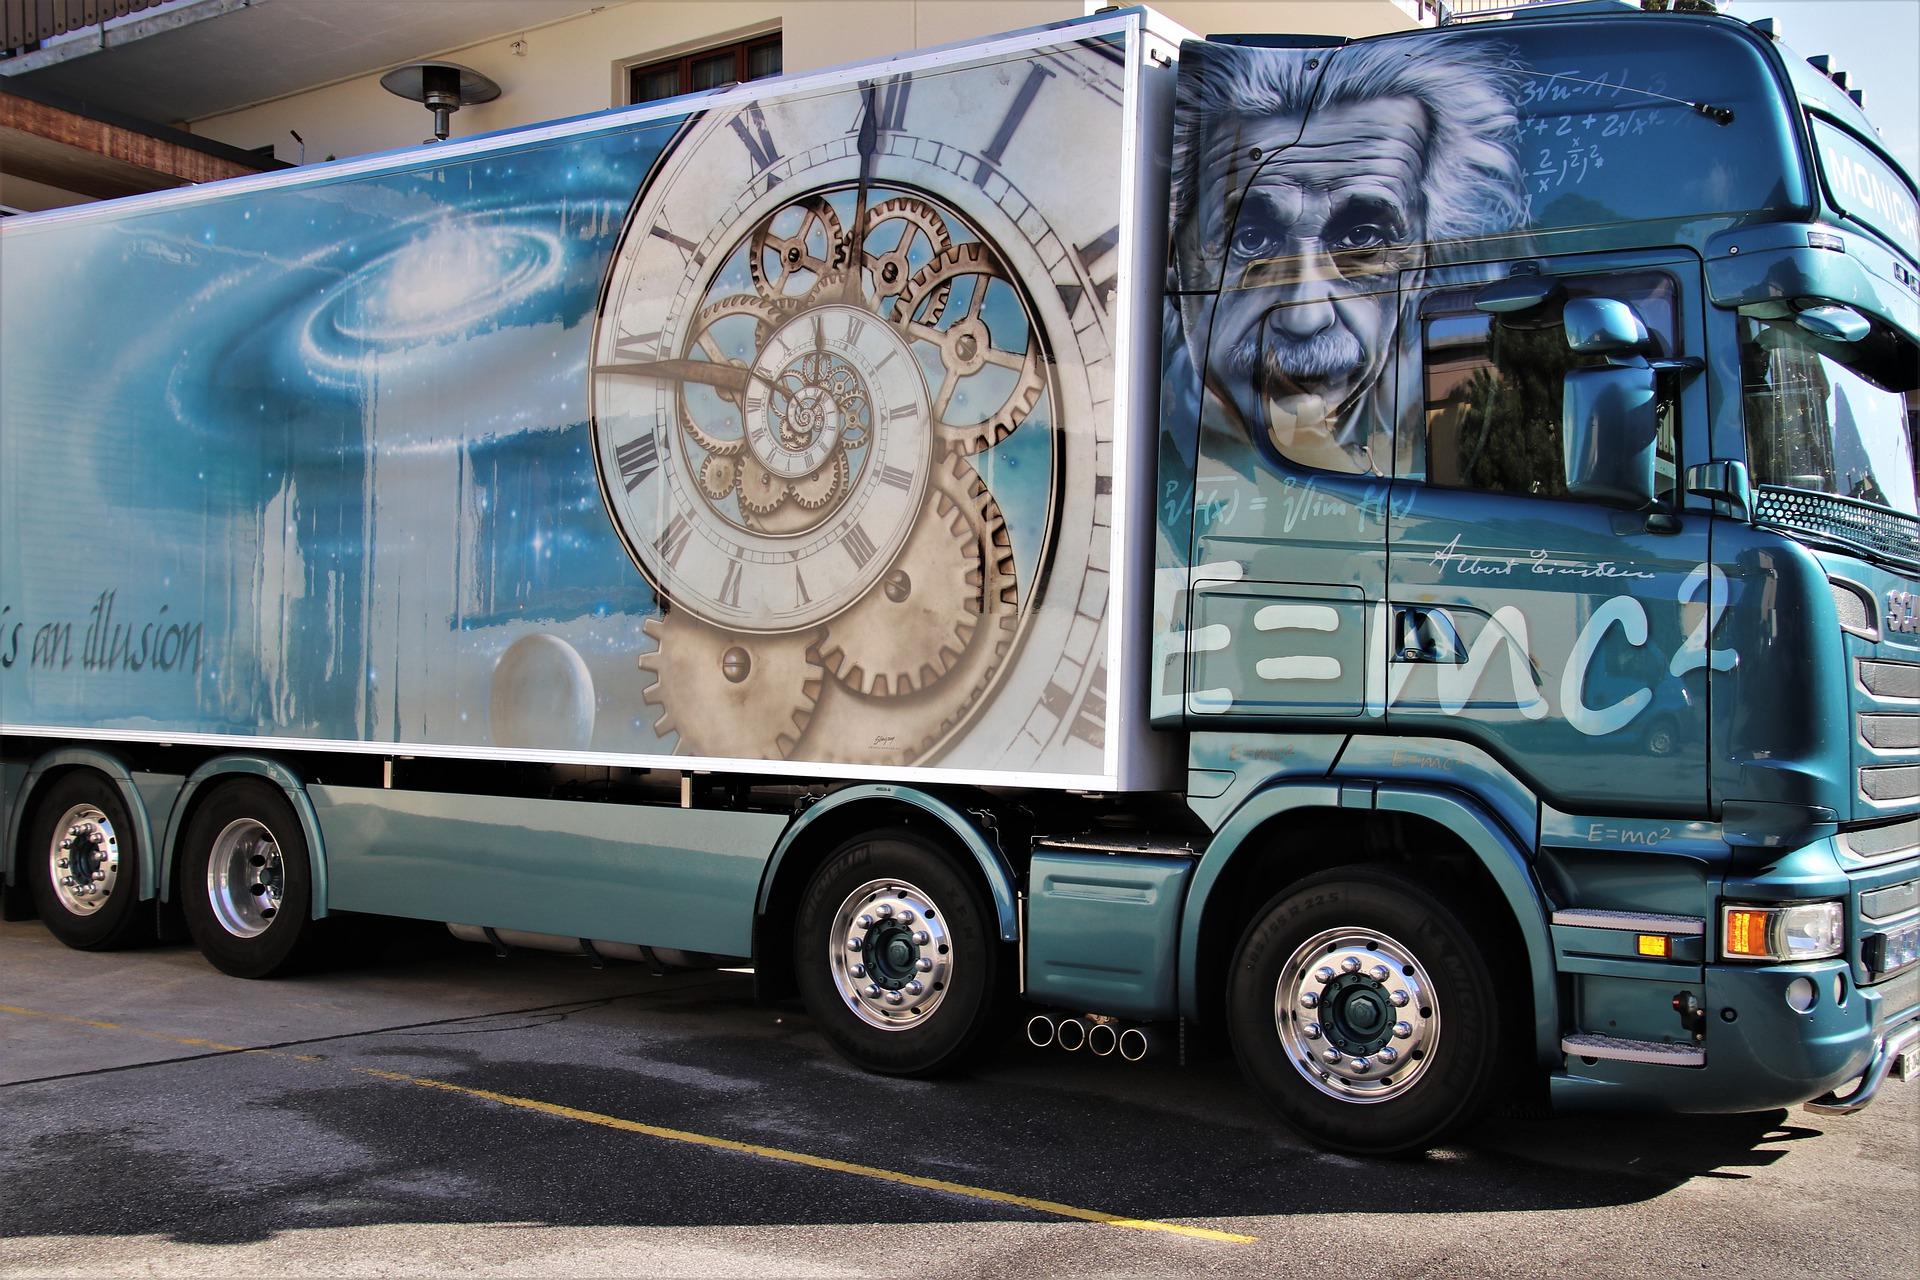 Anaxco Blog Beitrag Bild LKW Speditionssoftware Logistik-IT Transport-Manegement-System Cloud Tourenplanung Spedition